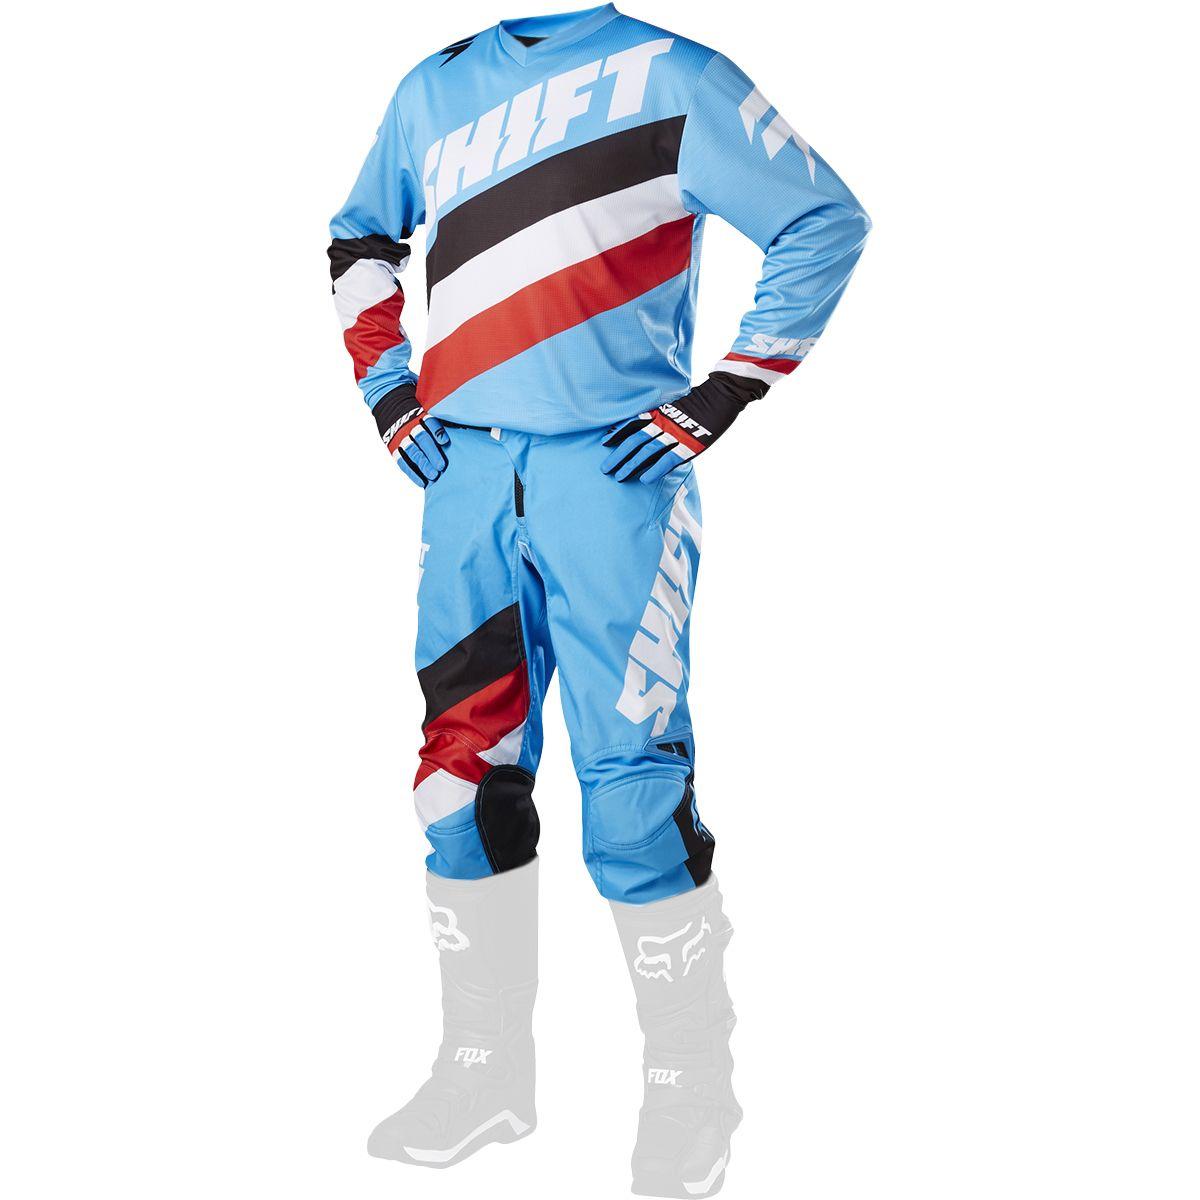 Shift - 2017 WHIT3 Tarmac комплект штаны и джерси, синие